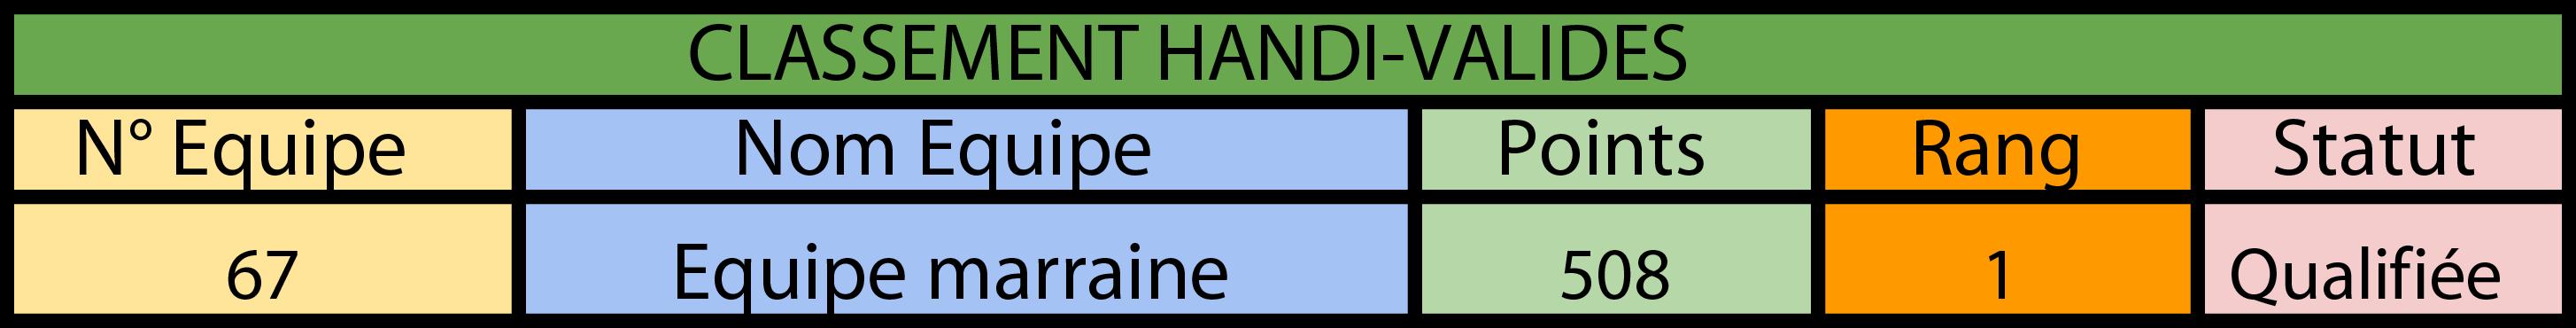 Classement Handi Prologue 2019